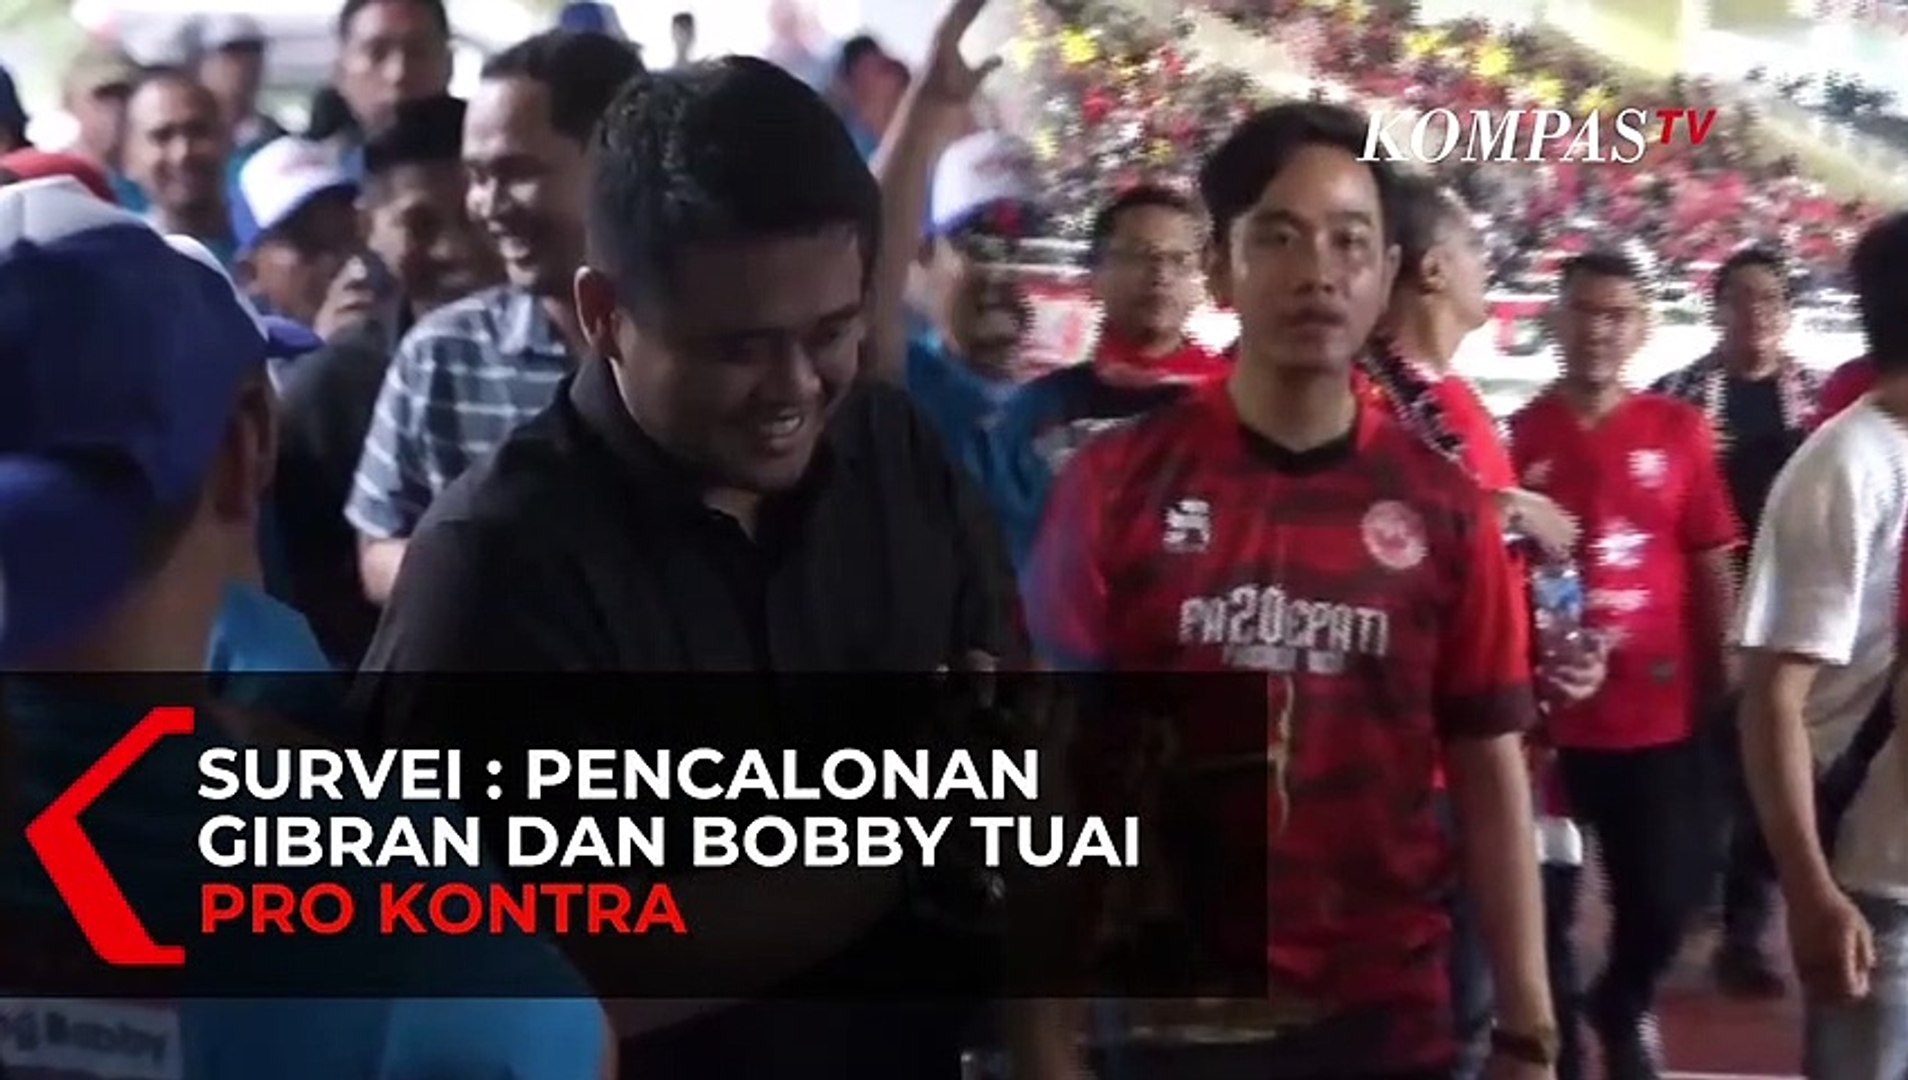 Survei Pencalonan Gibran Rakabuming dan Bobby Nasution Tuai Pro Kontra